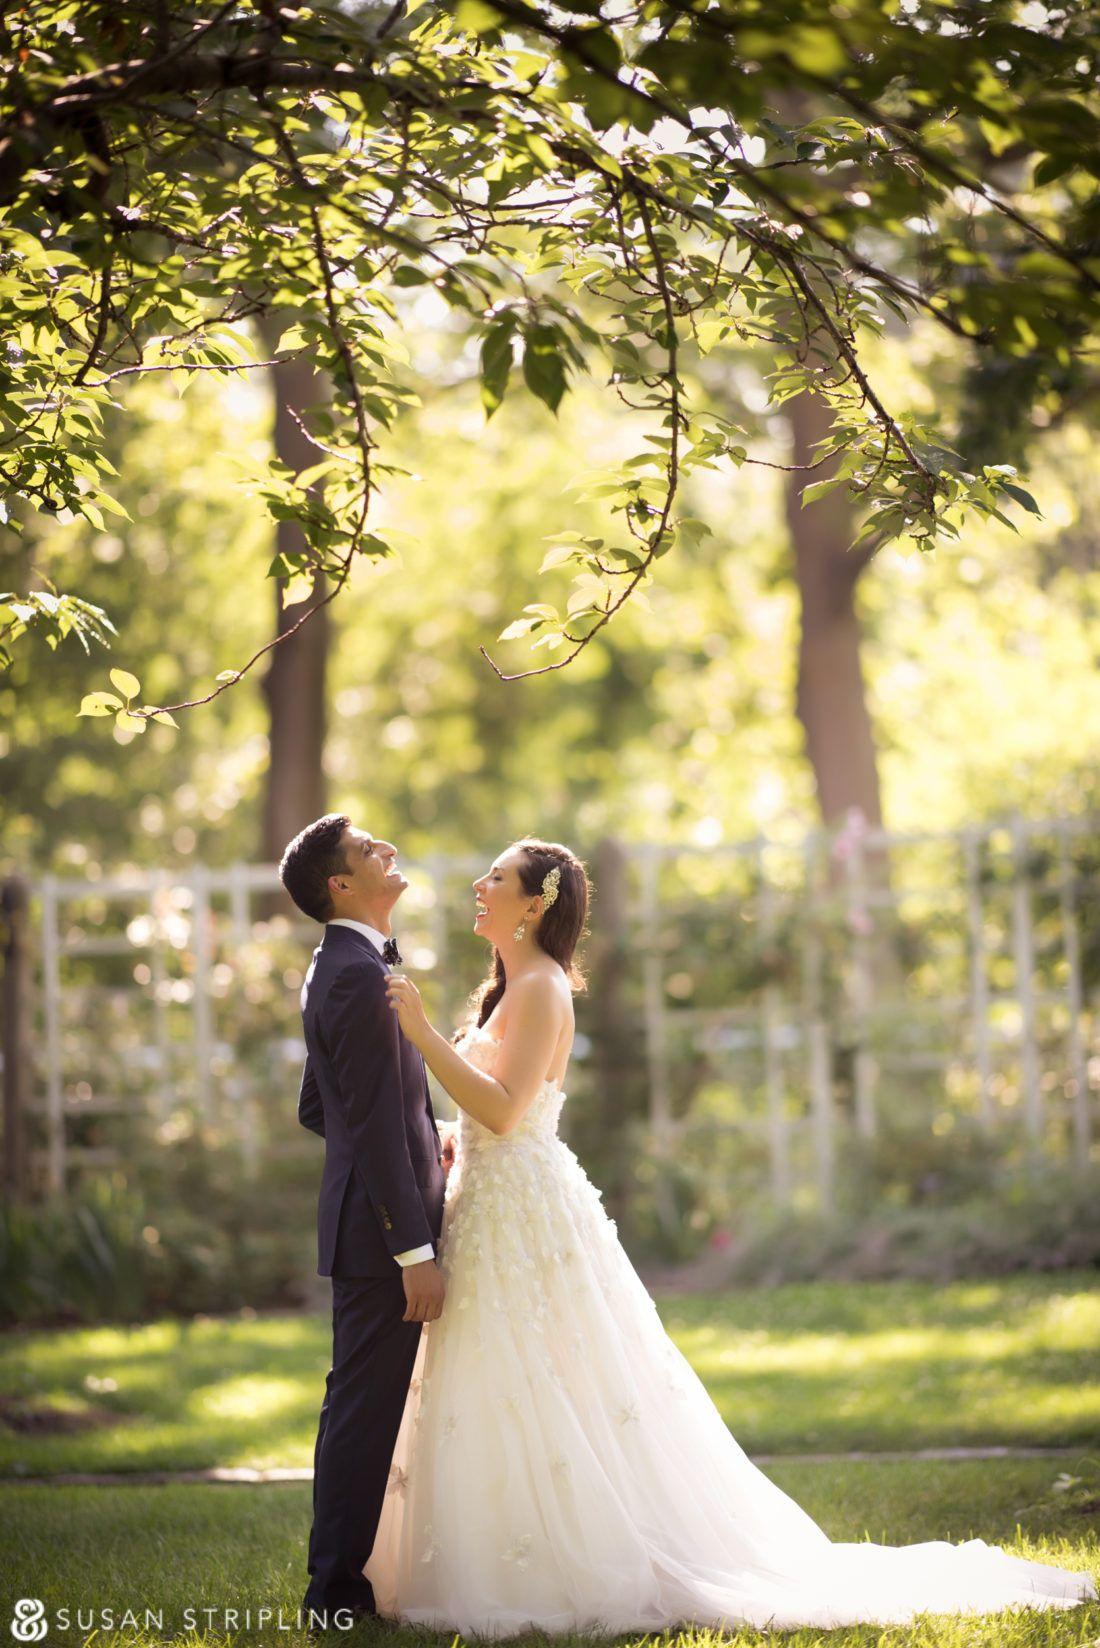 Summer Wedding at the Brooklyn Botanic Garden Brooklyn